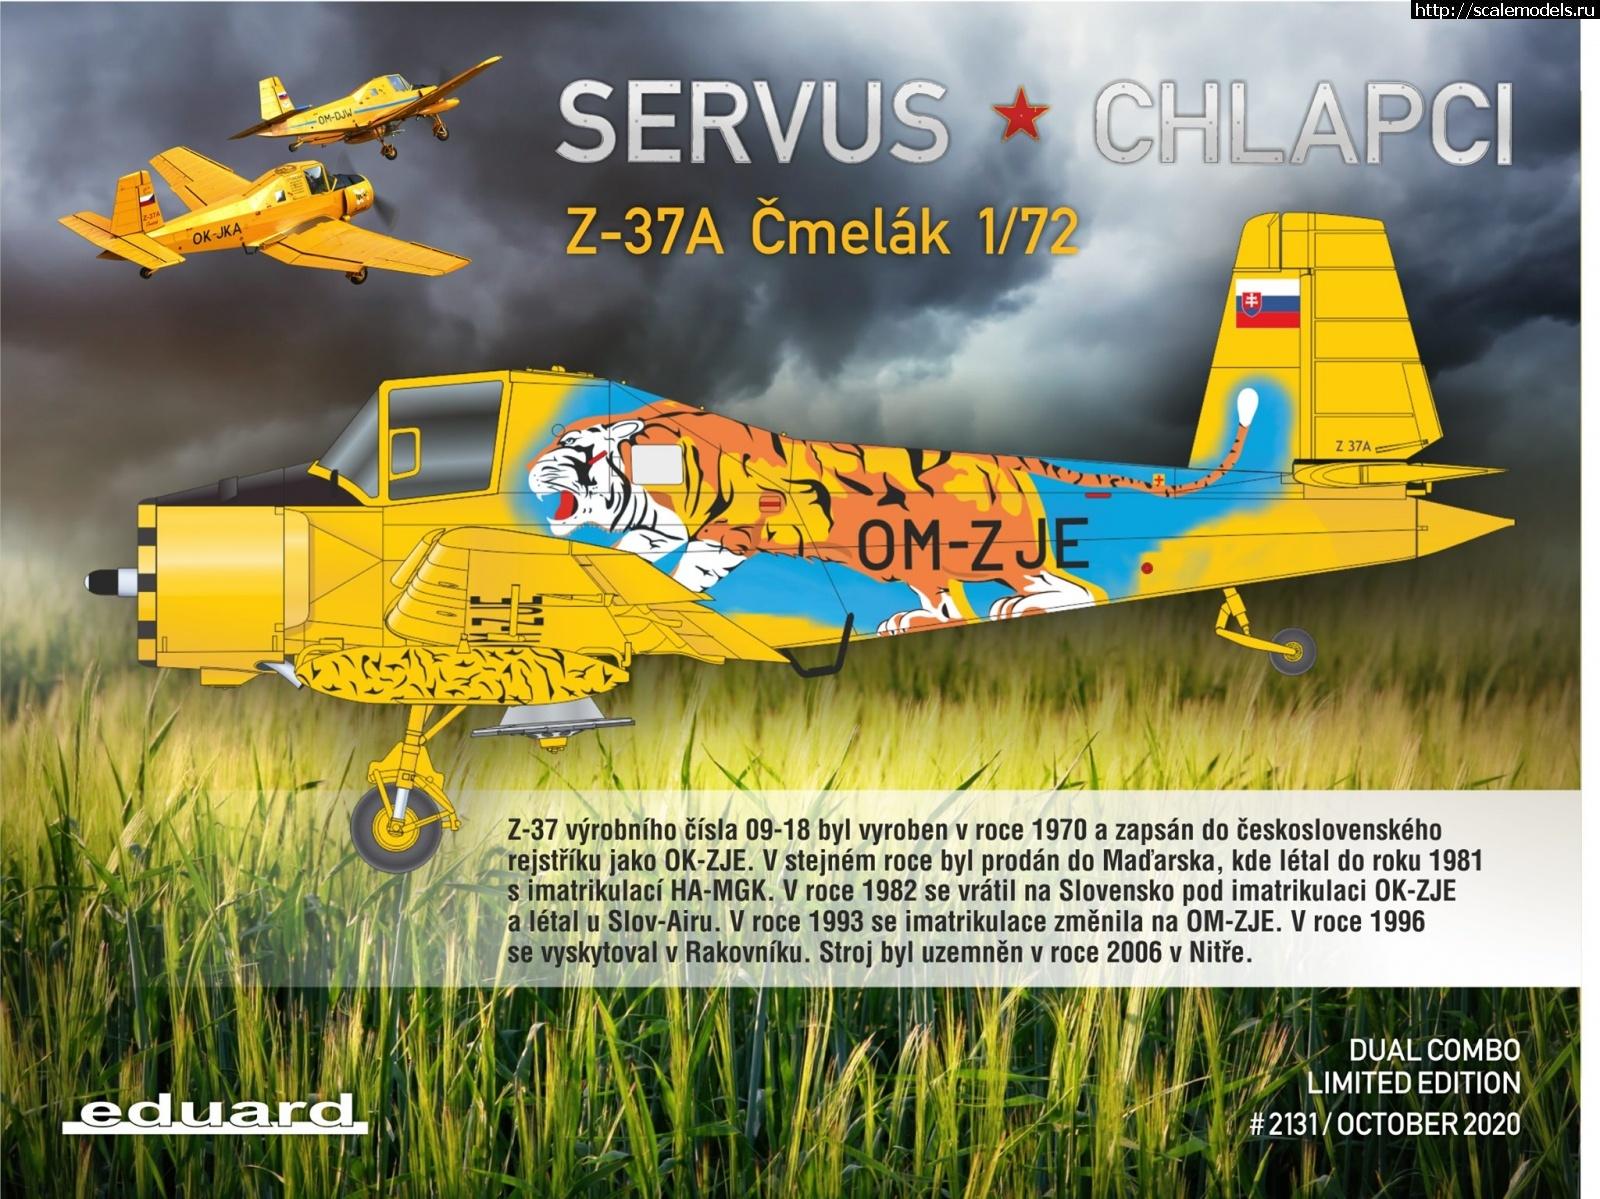 Анонс Servus chlapci (Eduard) 1/72 Zlin Z-37A Cmelak - Dual Combo Закрыть окно